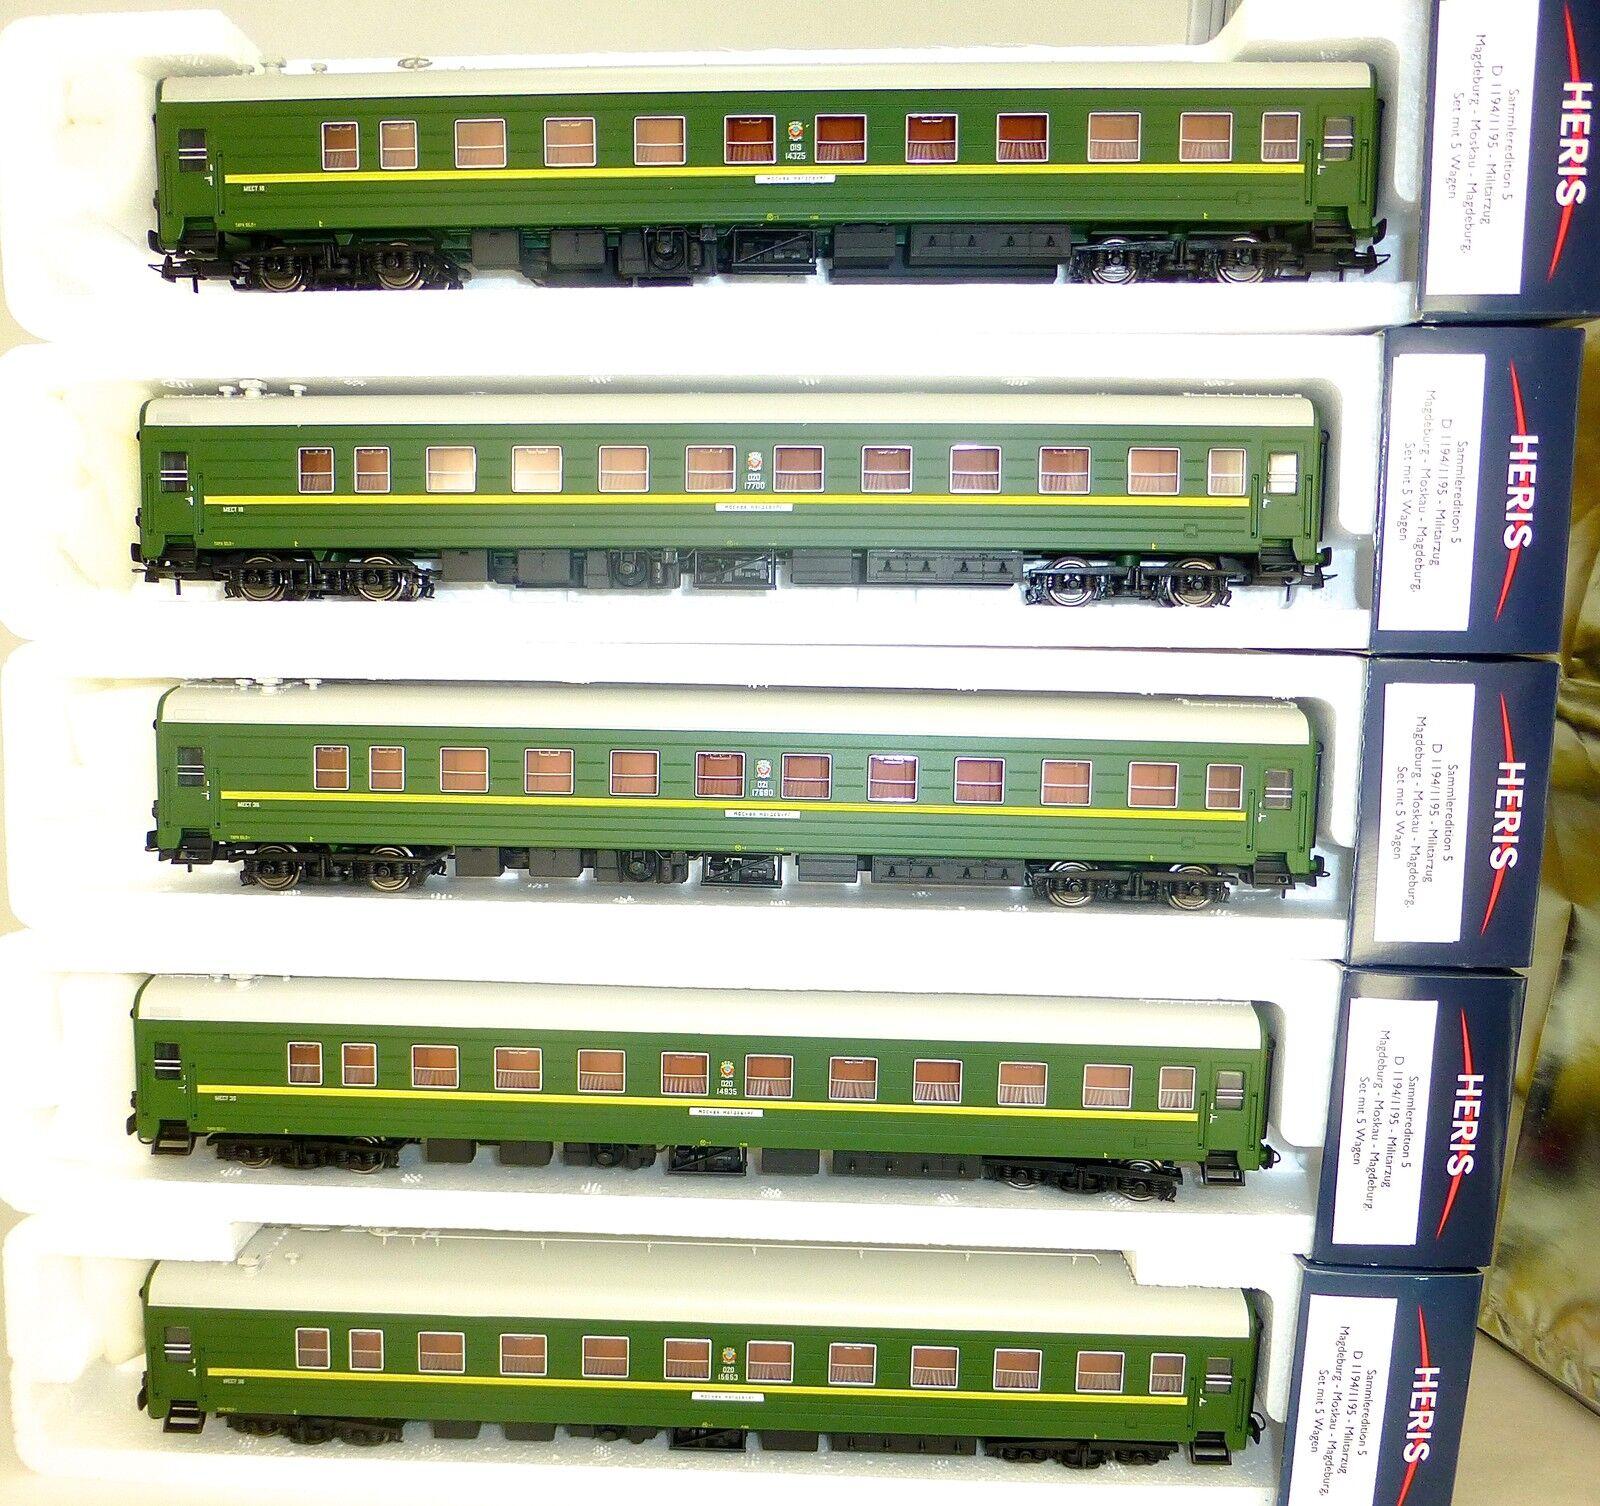 Tren Militar D 1194 1195 Moscú Magdeburg Soldado H0 1:87 Heris Emb.orig LF1 Μ